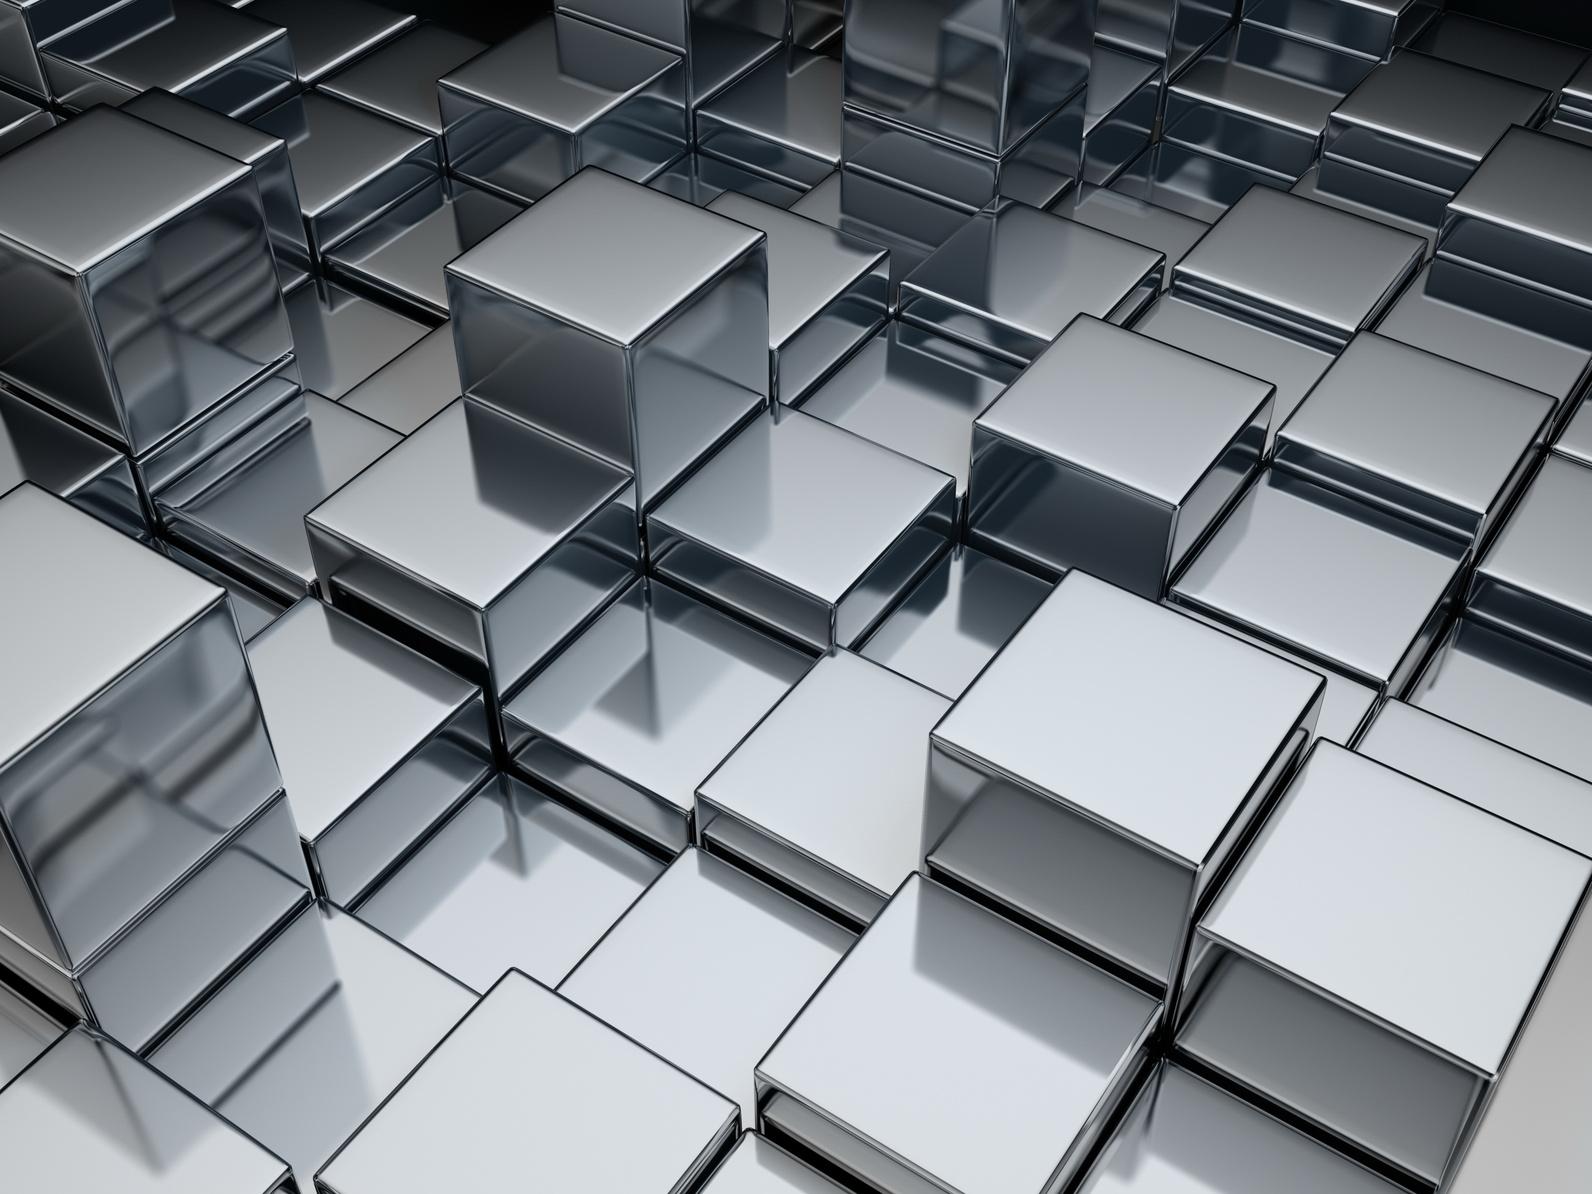 Cromatura bagno di cromo galvanica consonni - Lucidatura acciaio inox a specchio ...